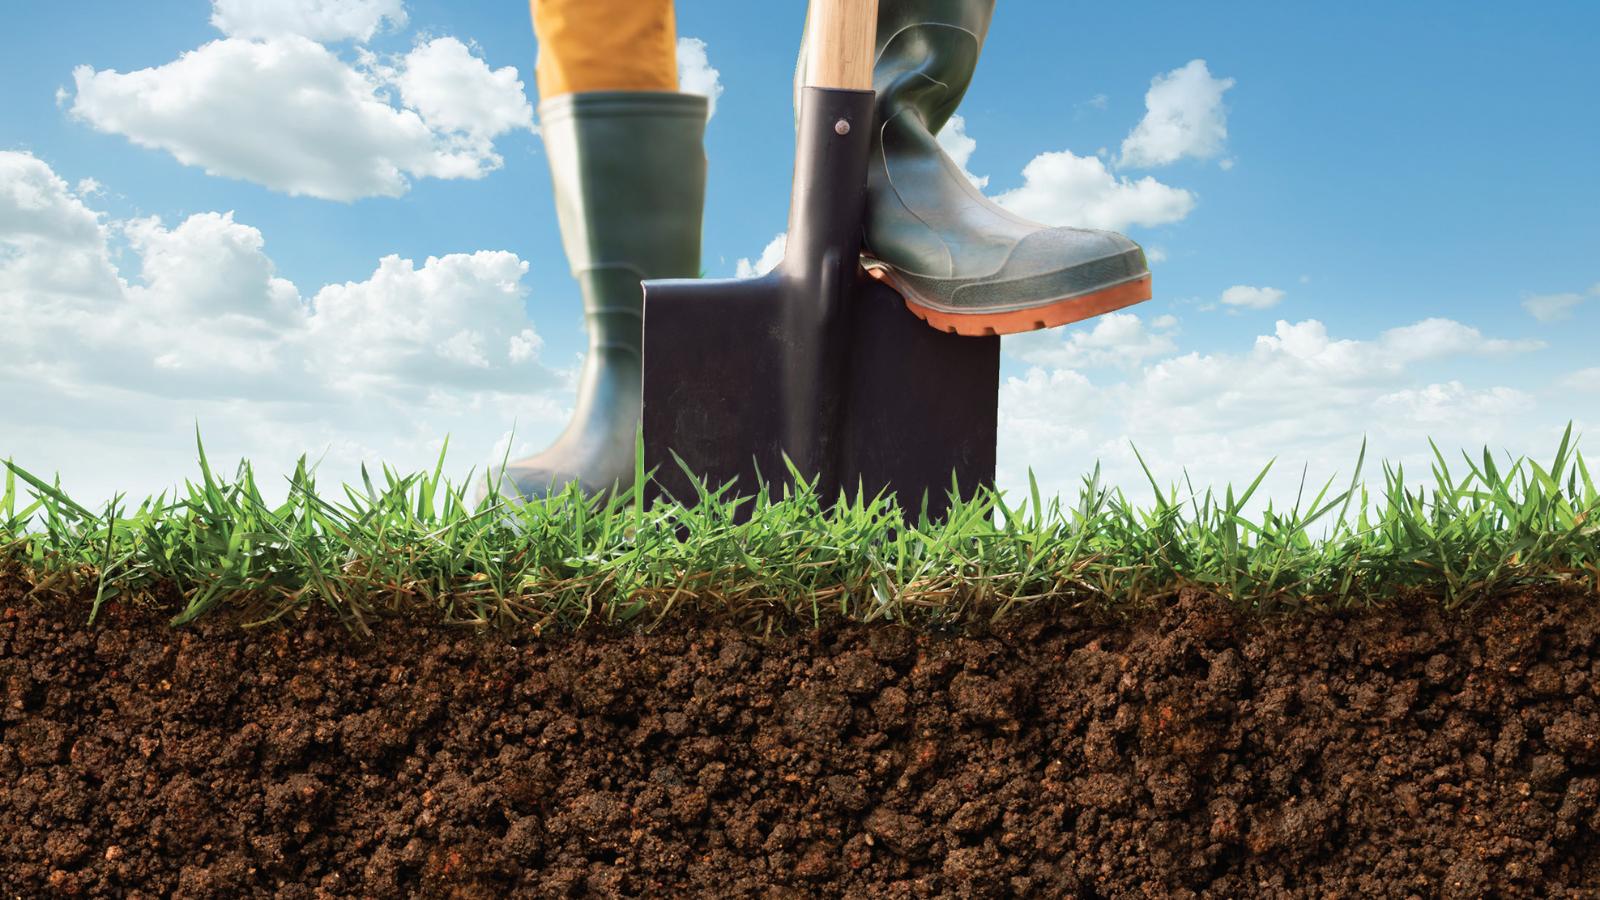 Foot pushing shovel into earth.